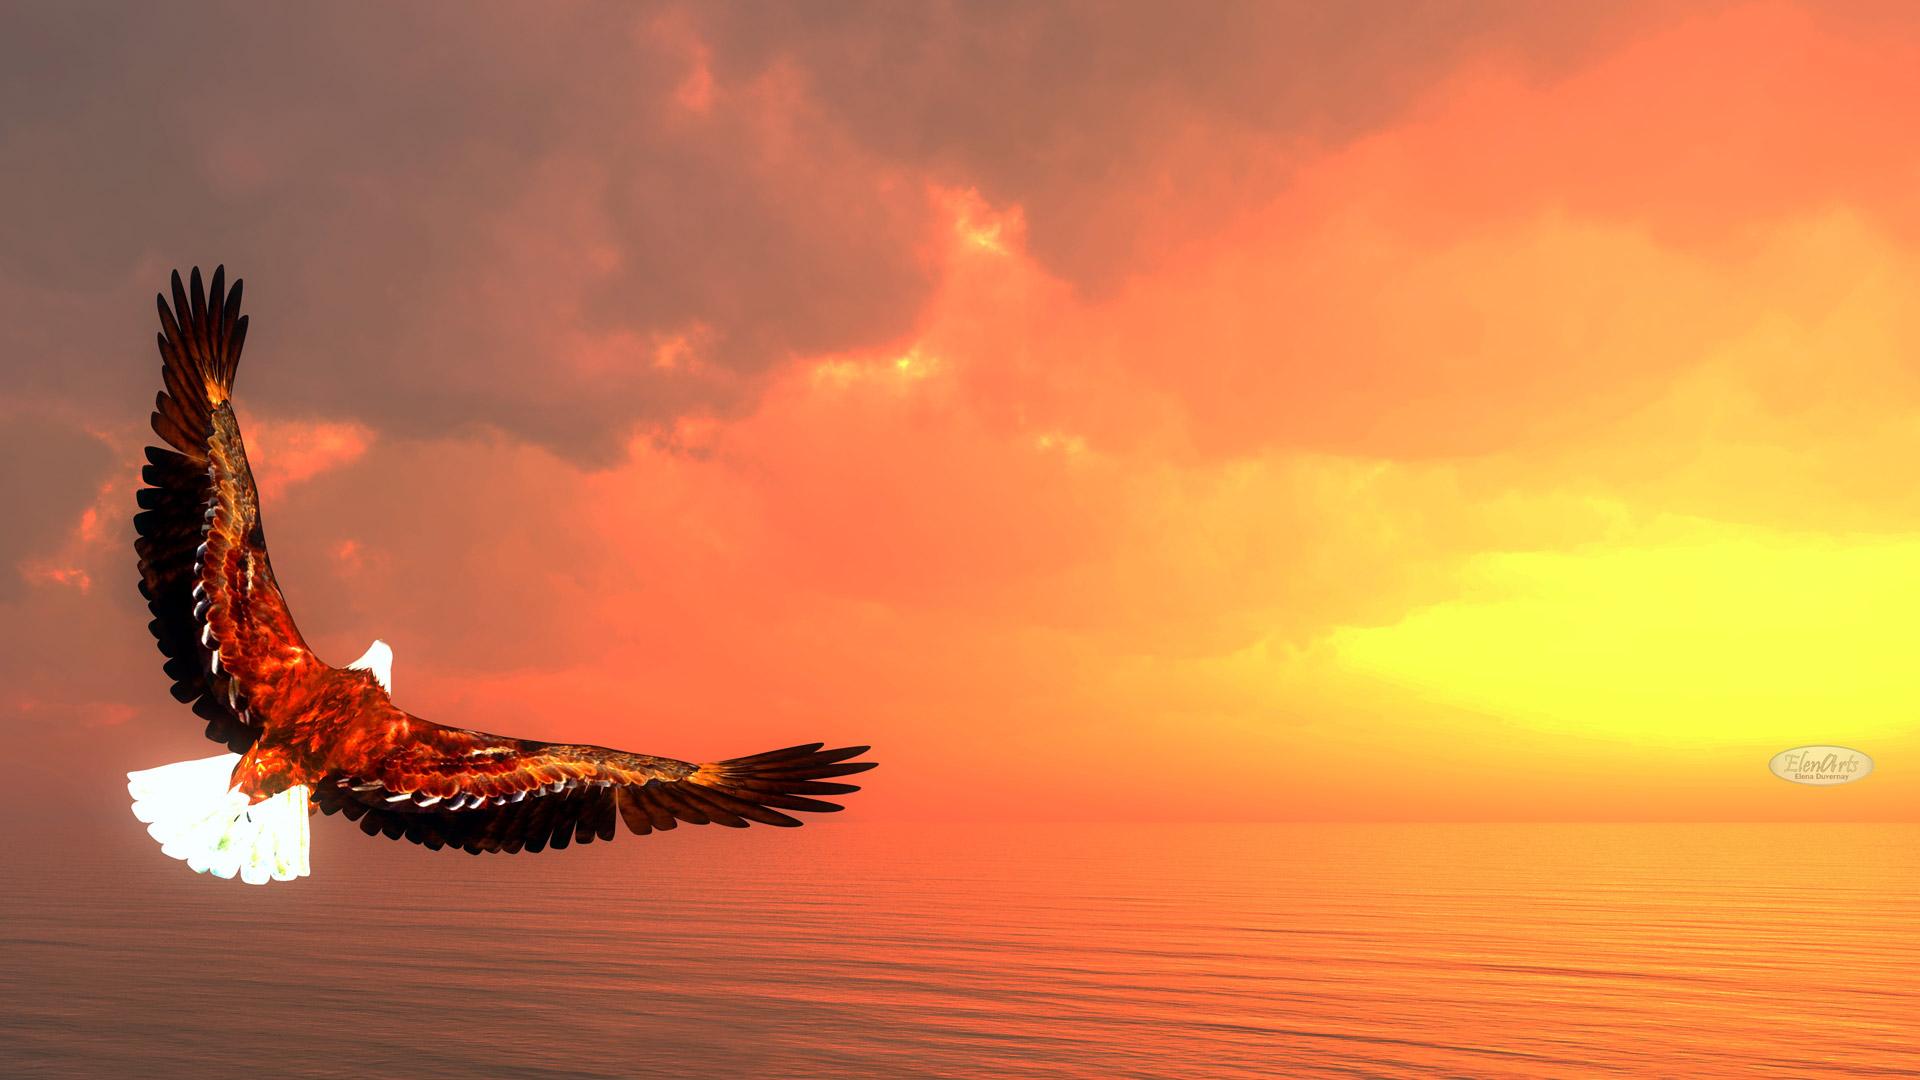 Eagle flying upon ocean by sunset - 3D render